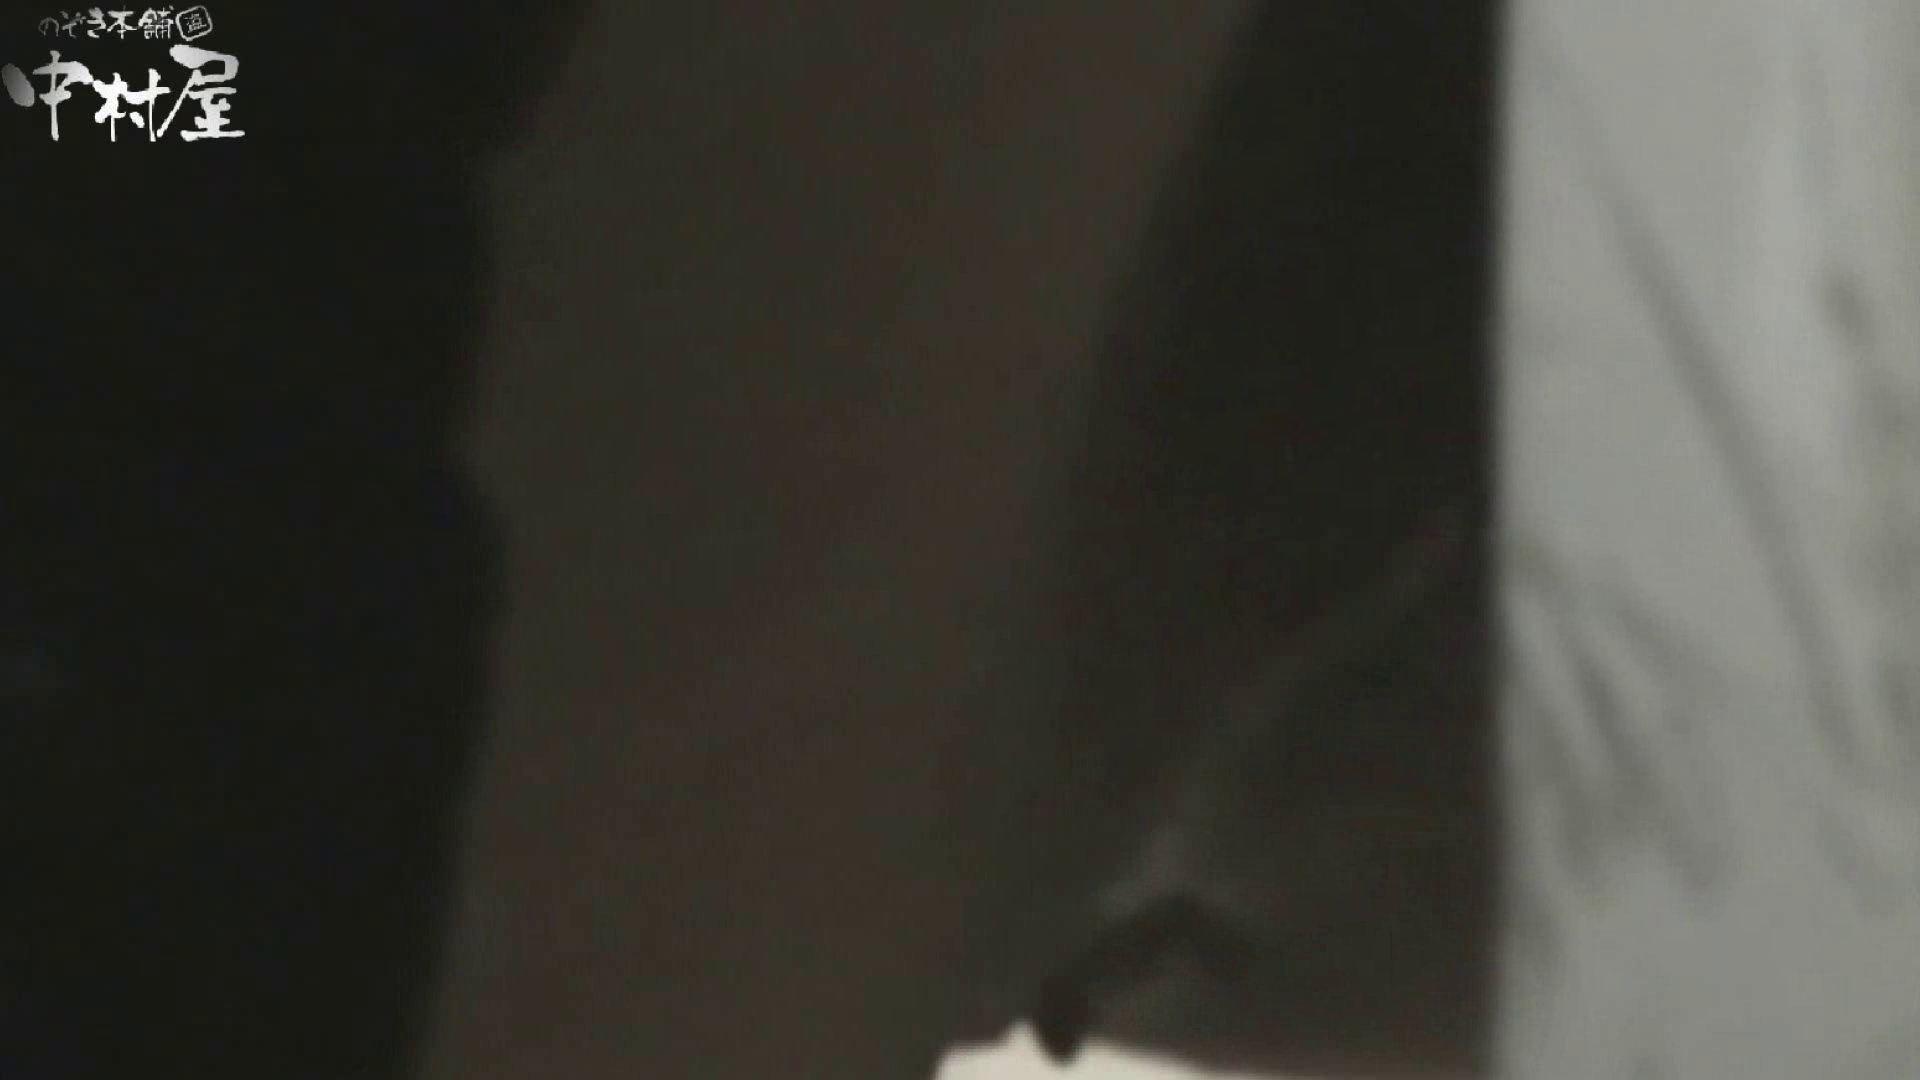 解禁!海の家4カメ洗面所vol.19 洗面所編 戯れ無修正画像 91PIX 71